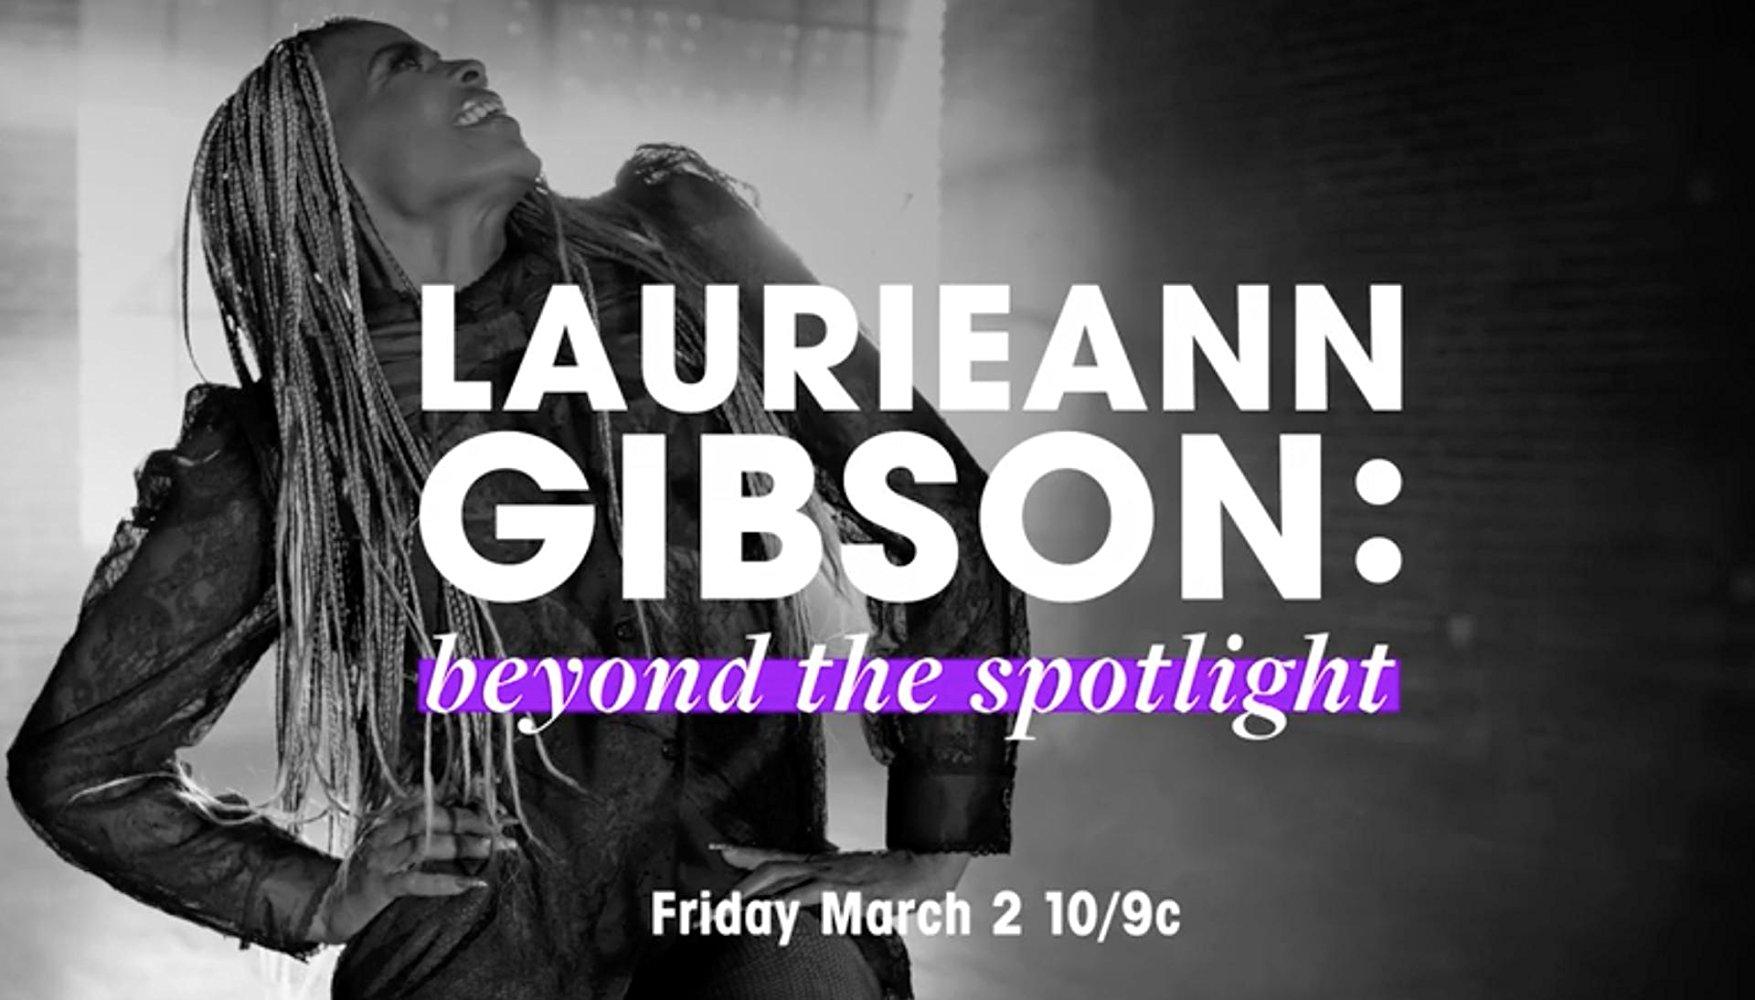 Laurieann Gibson Beyond the Spotlight .jpg